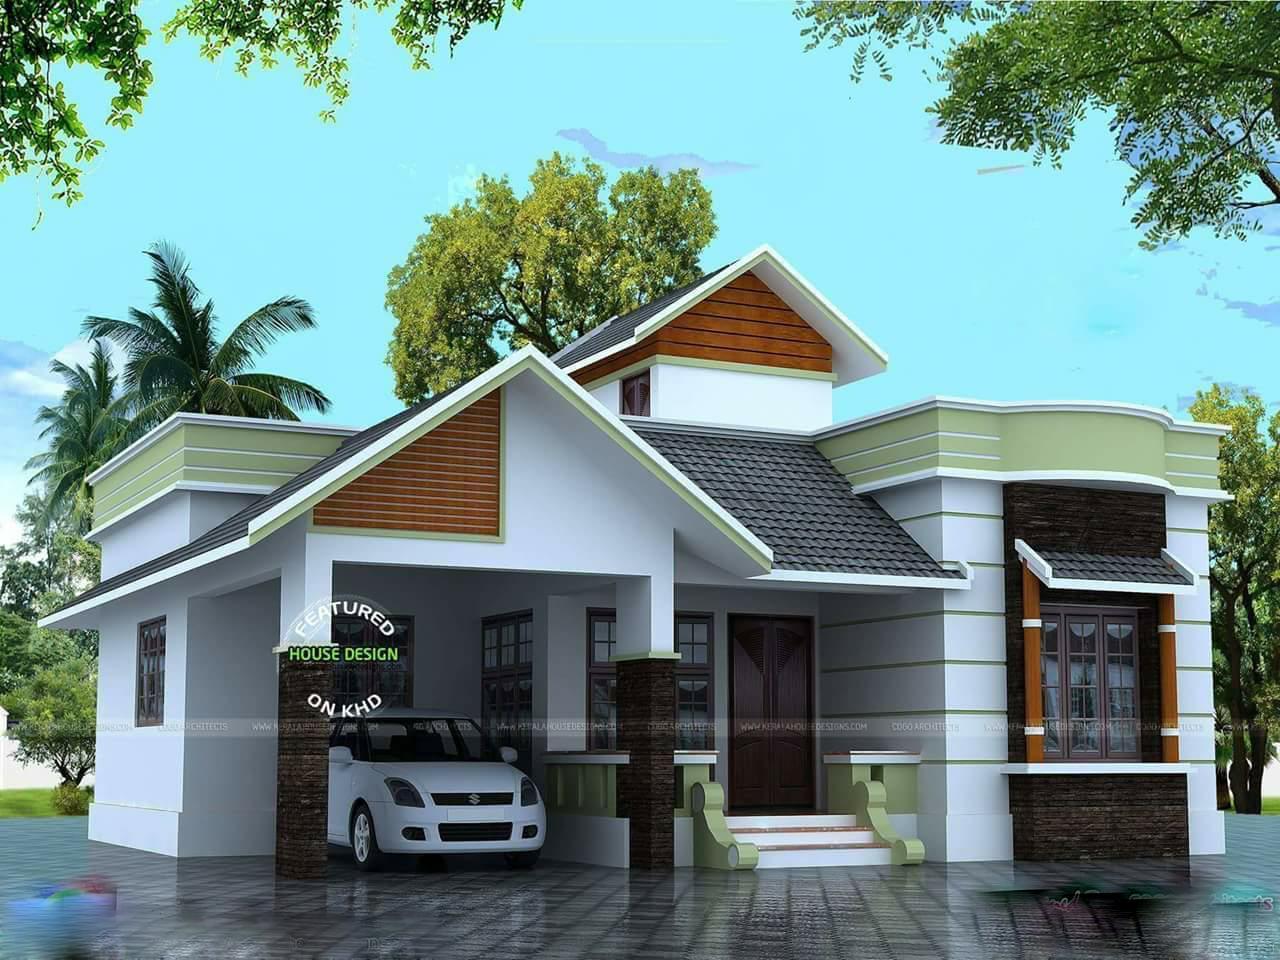 1190 Square Feet 2 Bedroom Single Floor Modern Home Design and Plan